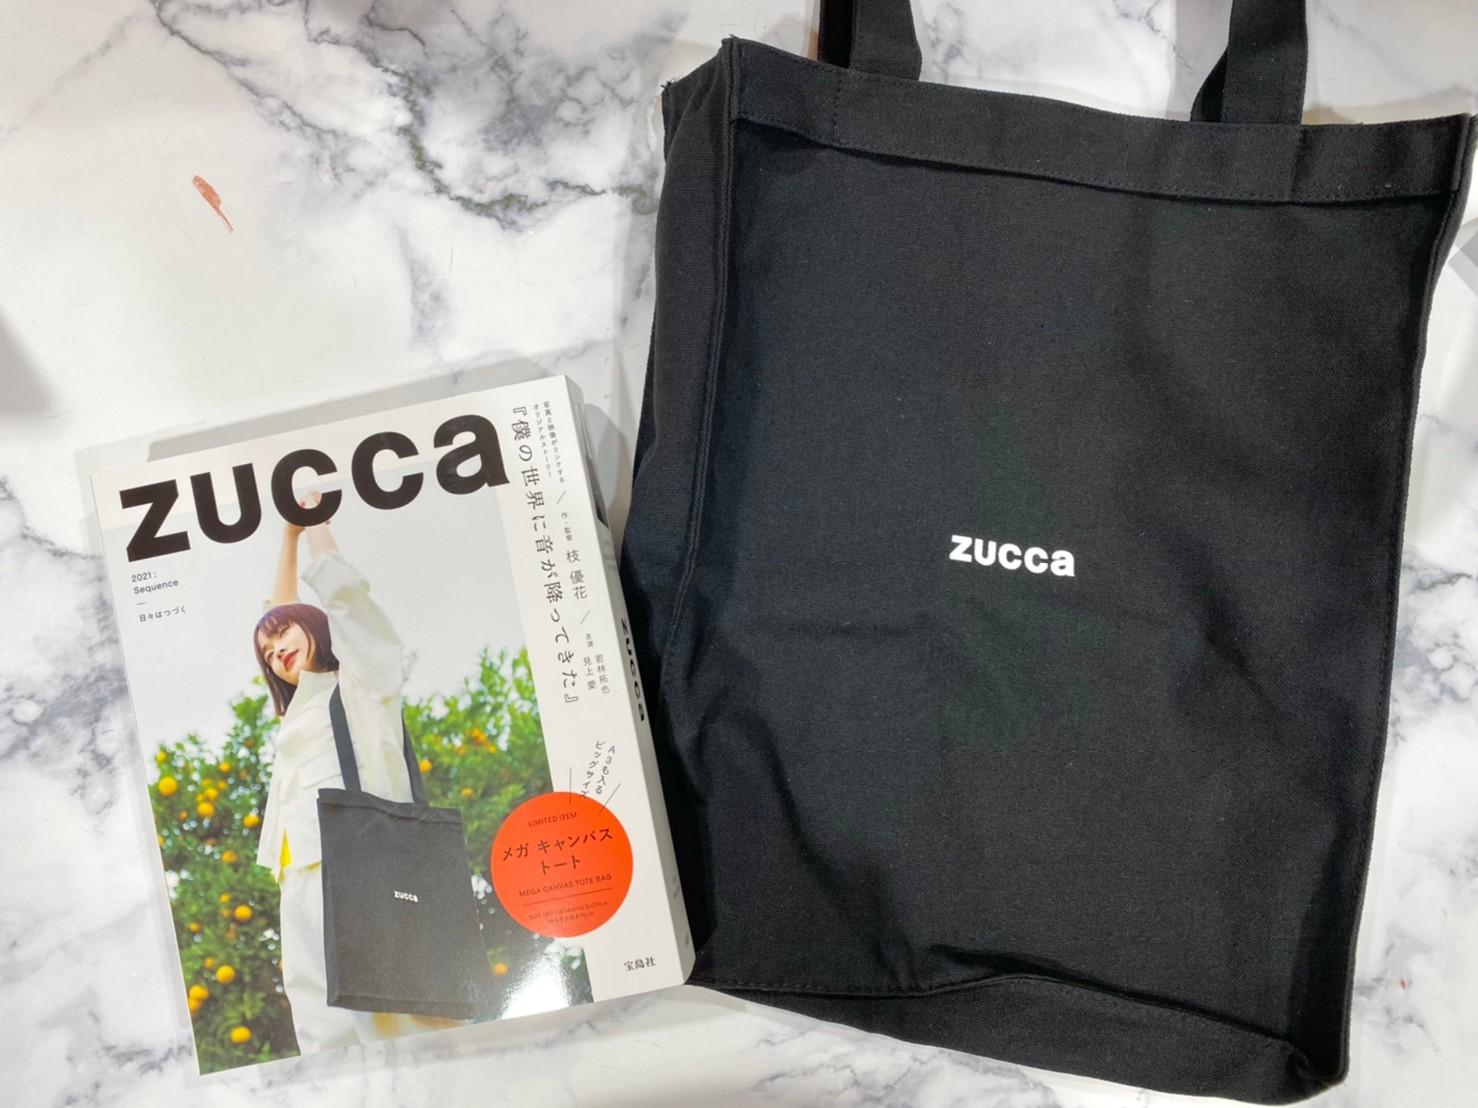 ZUCCa 2021:Sequenceと付録の画像